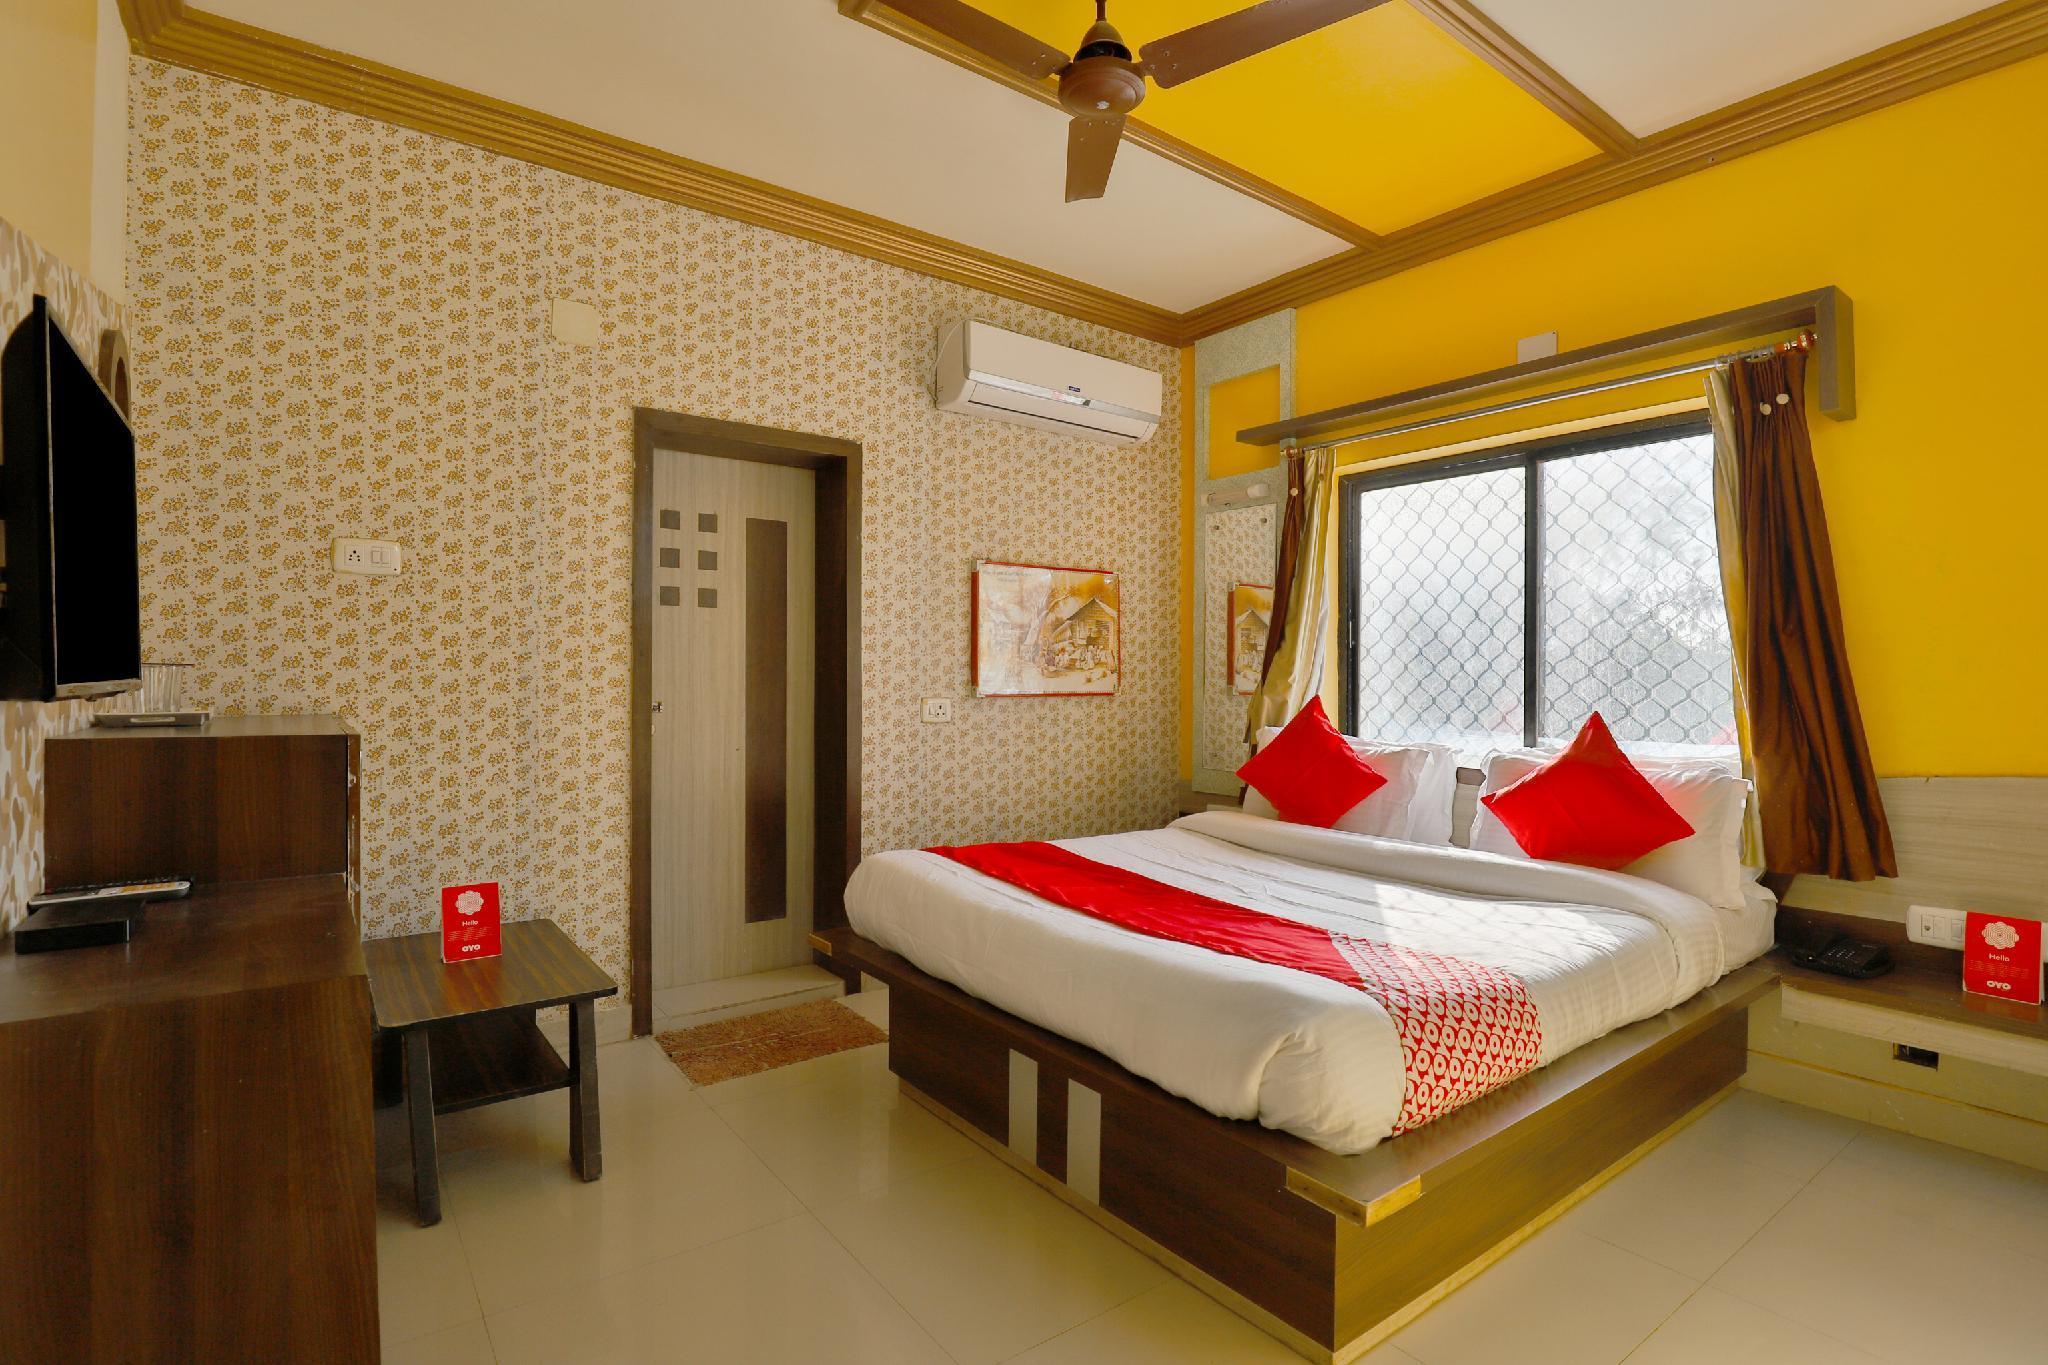 OYO 17205 Raj Palace, Devbhumi Dwarka